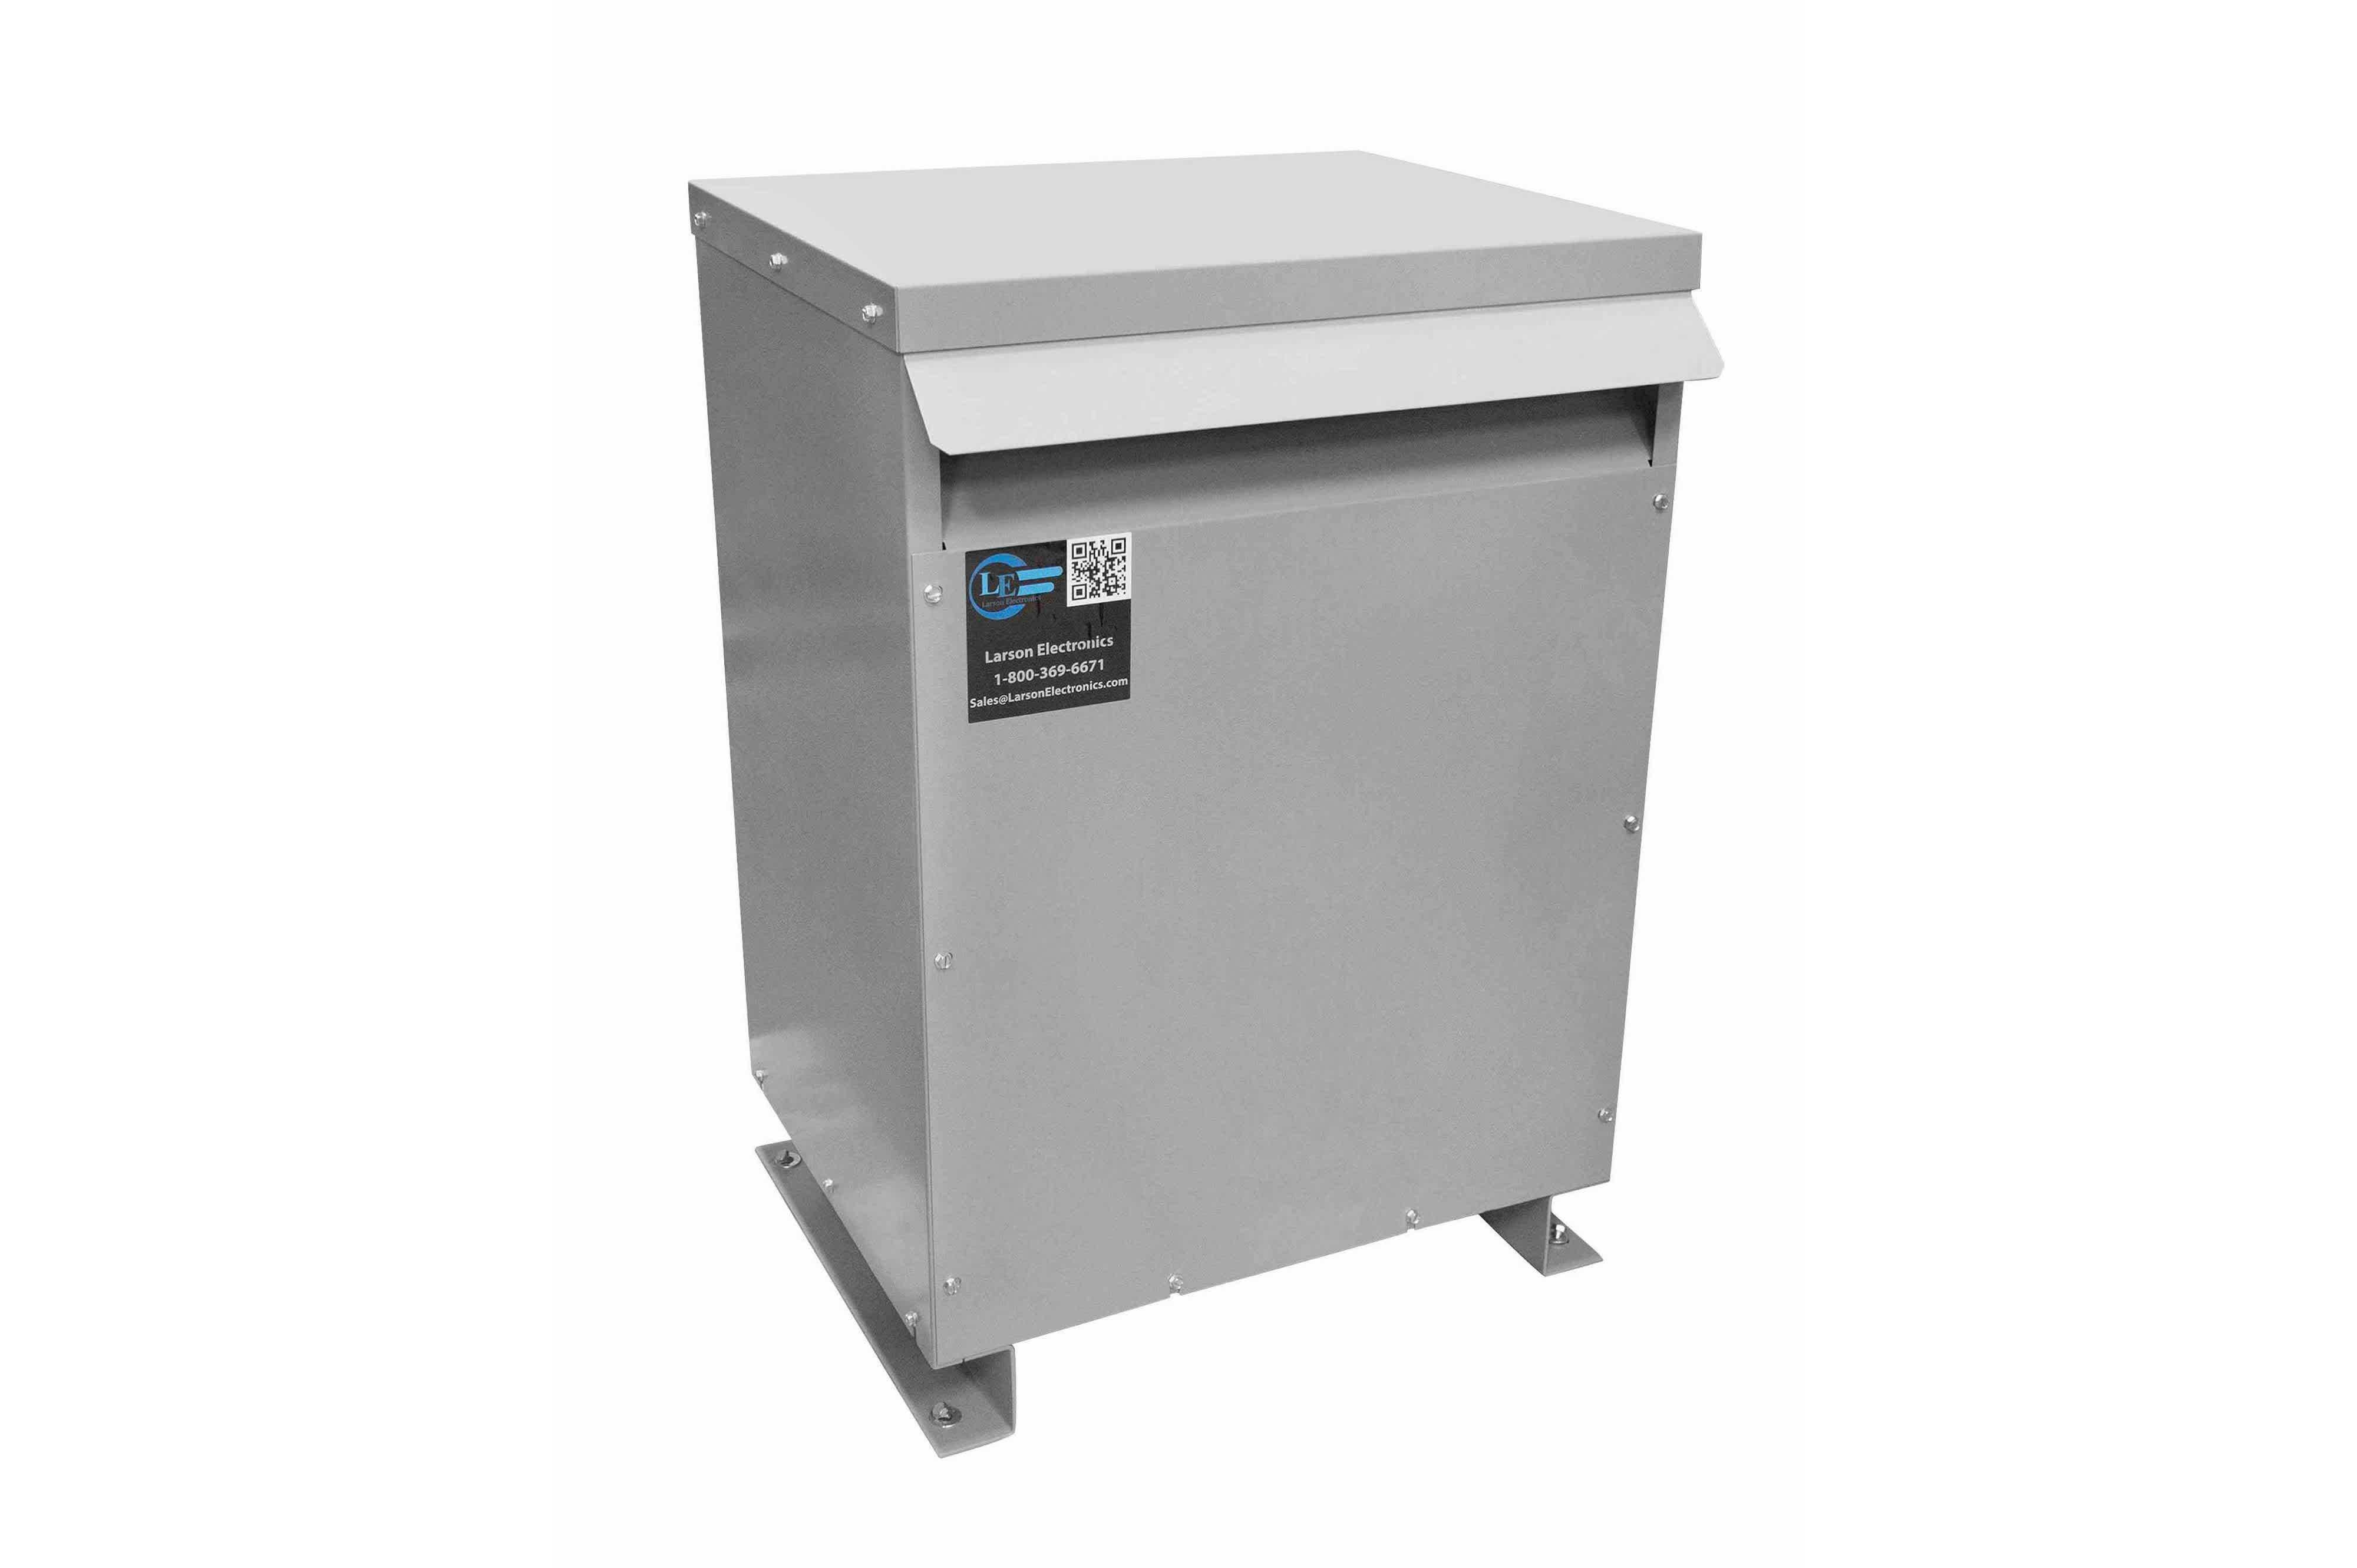 22.5 kVA 3PH Isolation Transformer, 208V Wye Primary, 380V Delta Secondary, N3R, Ventilated, 60 Hz